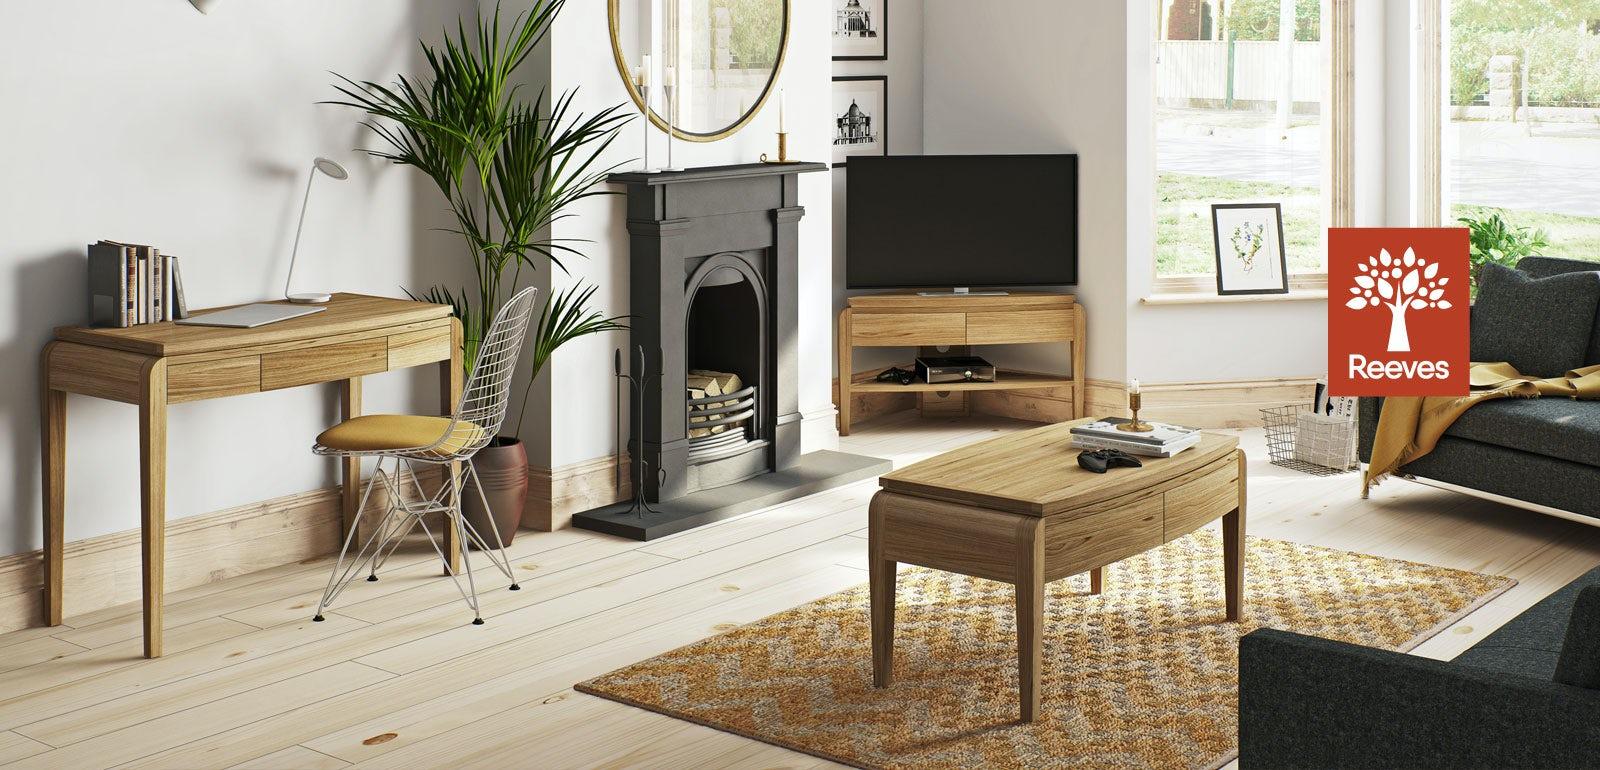 Samuel Living Furniture Range